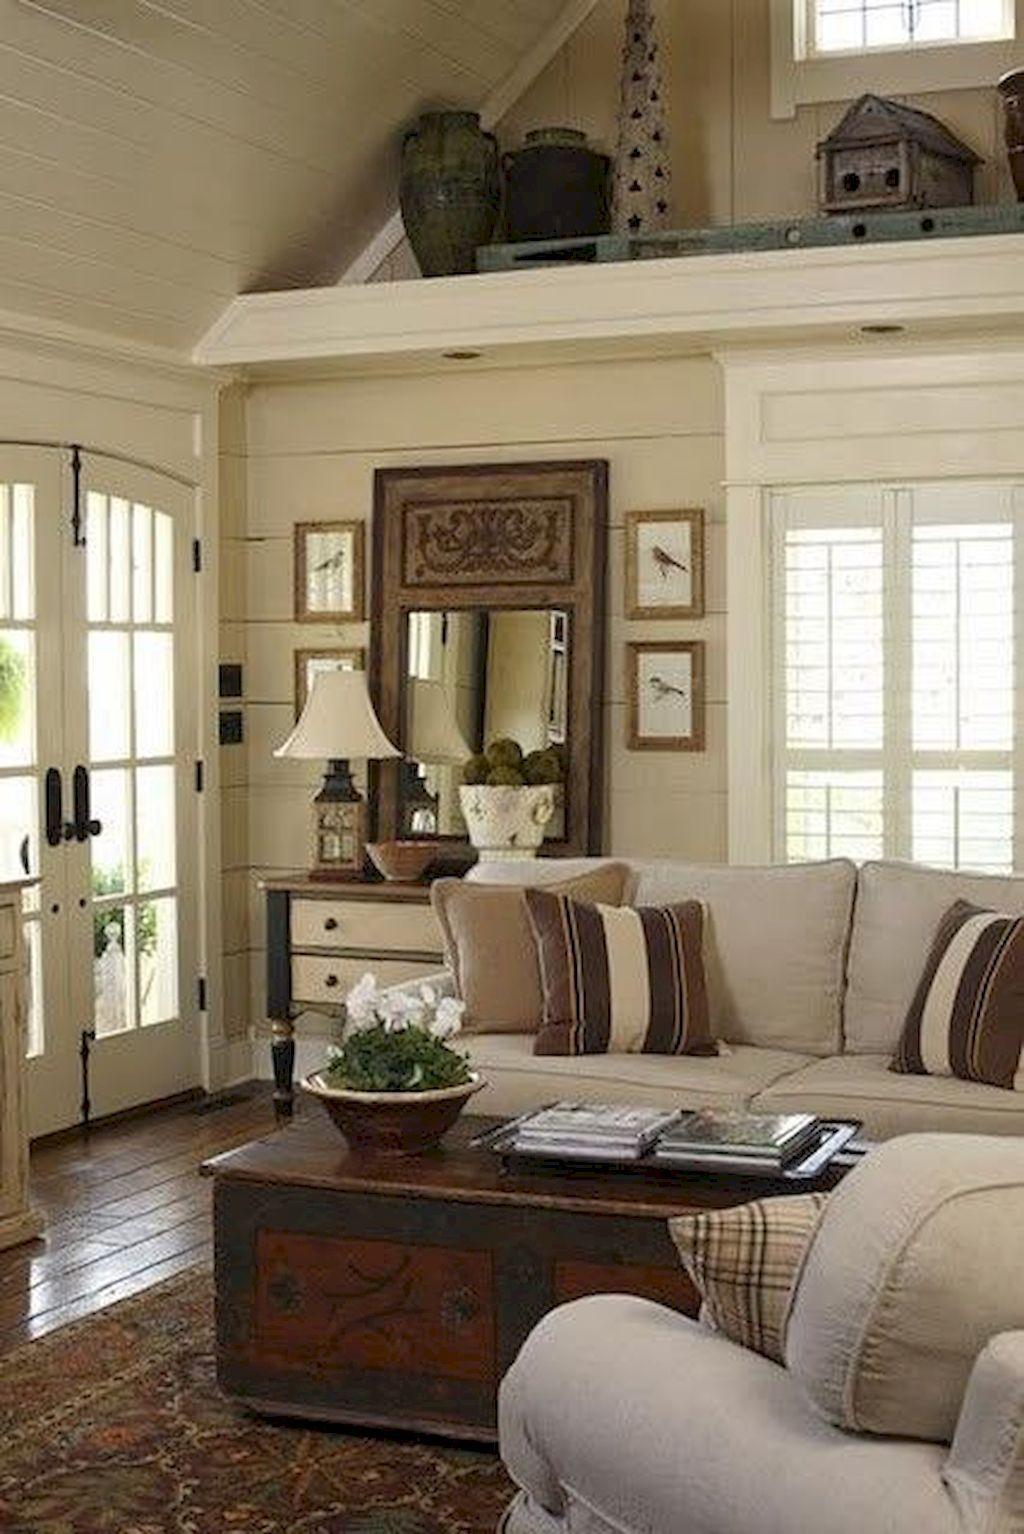 Photo of Great Living Room Design #furnituredecor #LivingRoomFurnitureArrangementIdeas